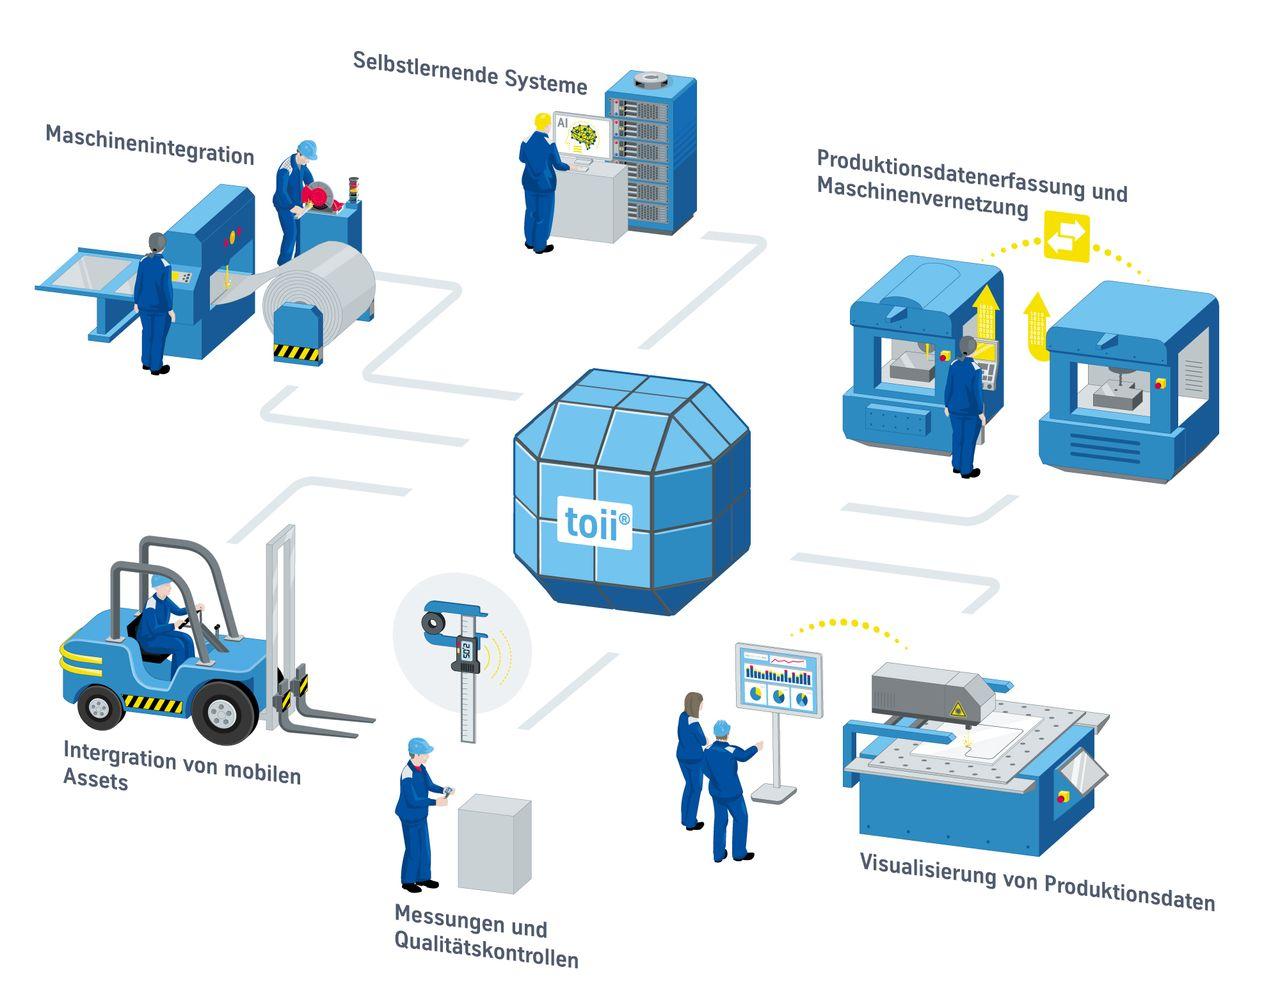 KI, AI, Maschinenintegration, Produktionsdaten, Produktionsdatenerfassung, Maschinenvernetzung, Qualitätskontrolle, mobile Assets,